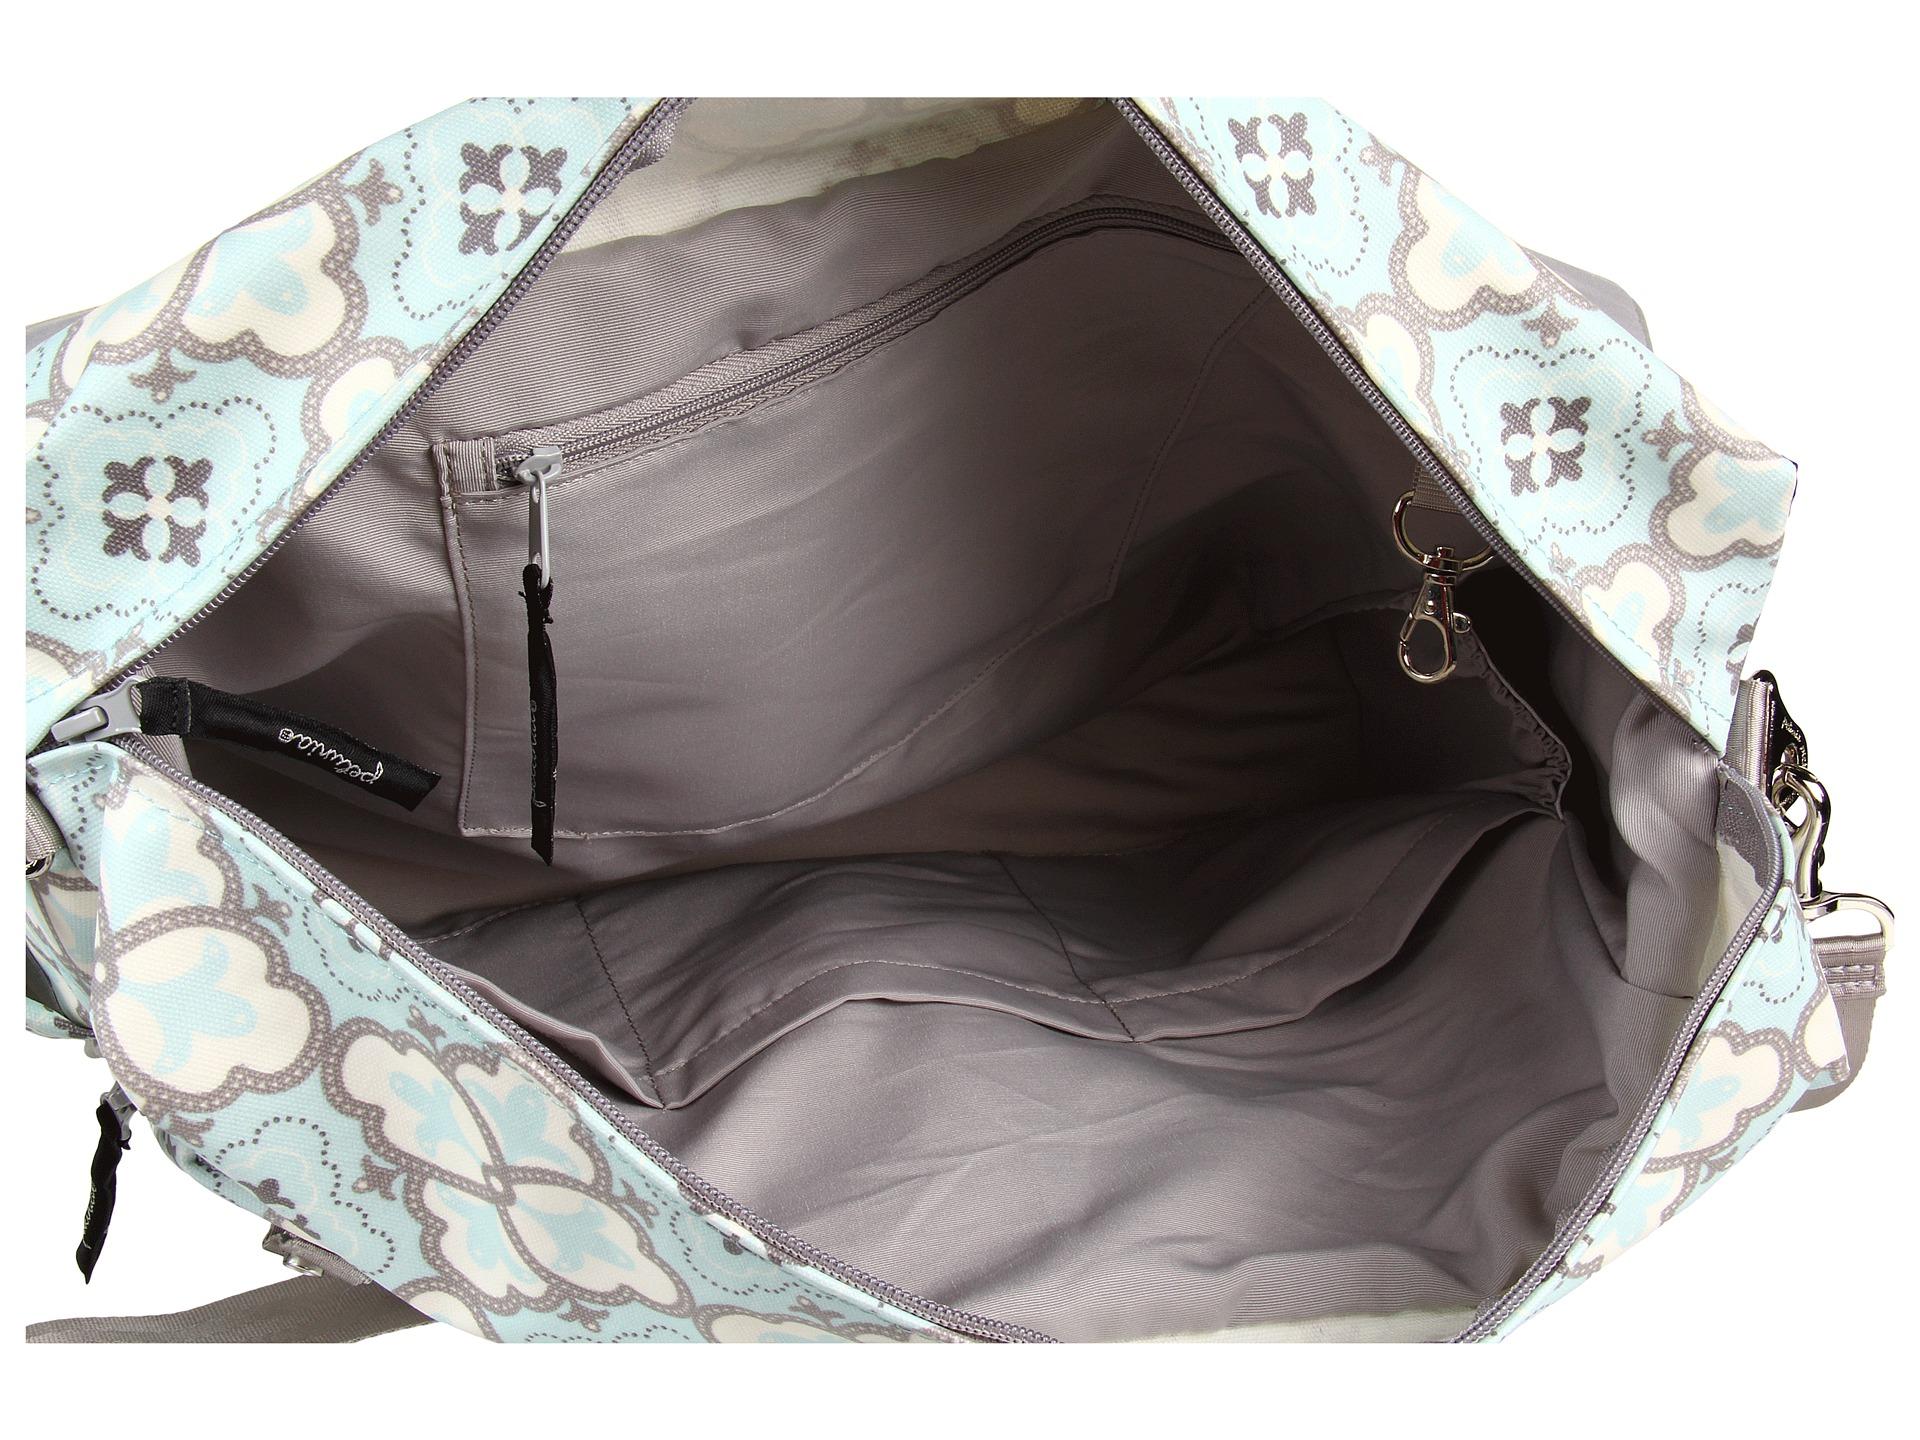 petunia pickle bottom abundance boxy backpack free shipping both. Black Bedroom Furniture Sets. Home Design Ideas